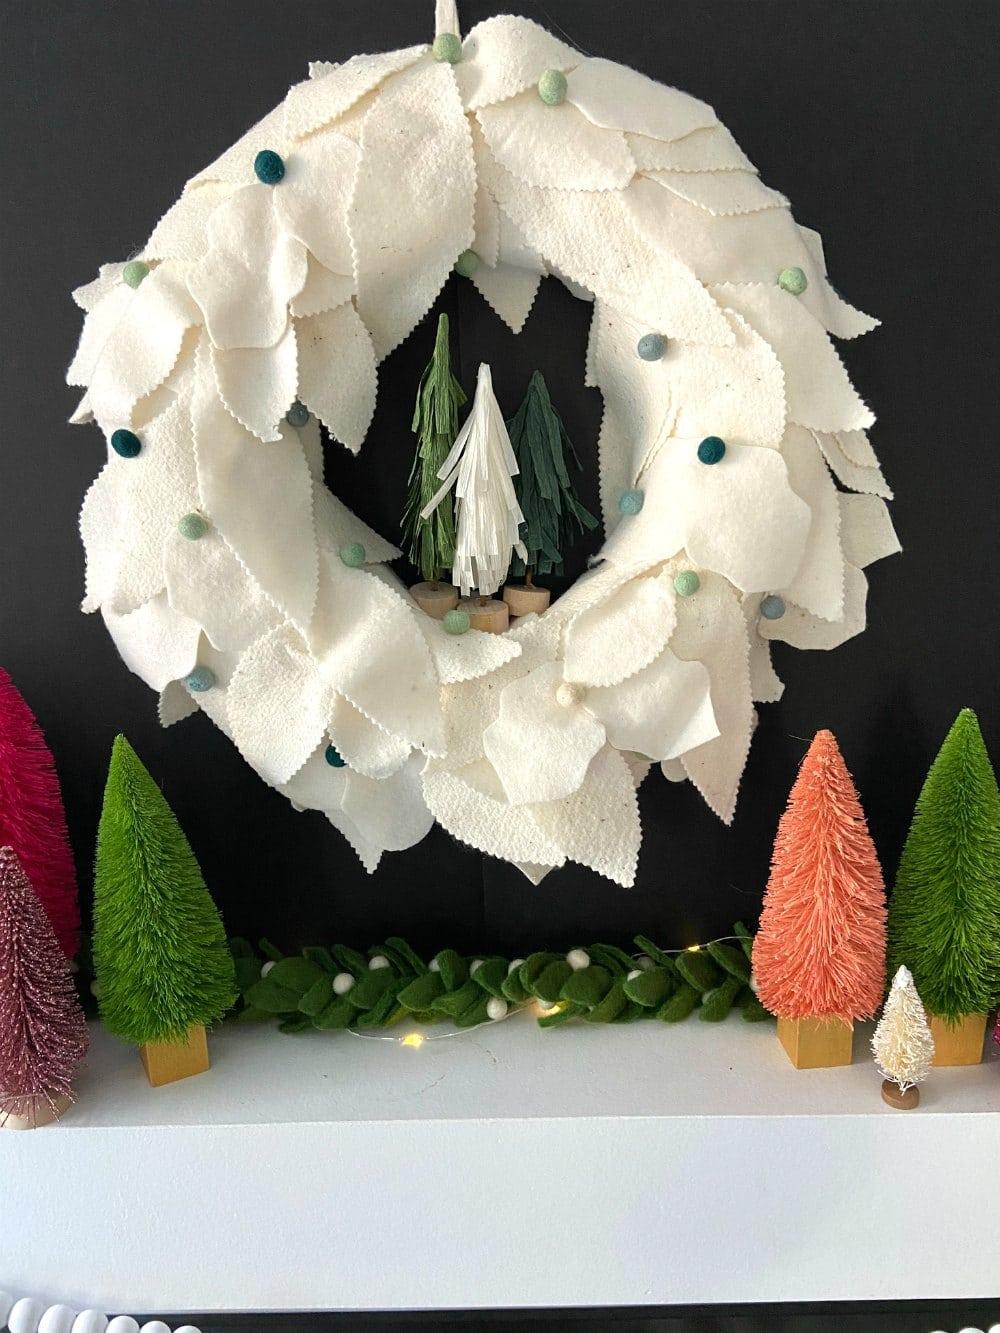 Anthropologie knock off felt flower wreath.